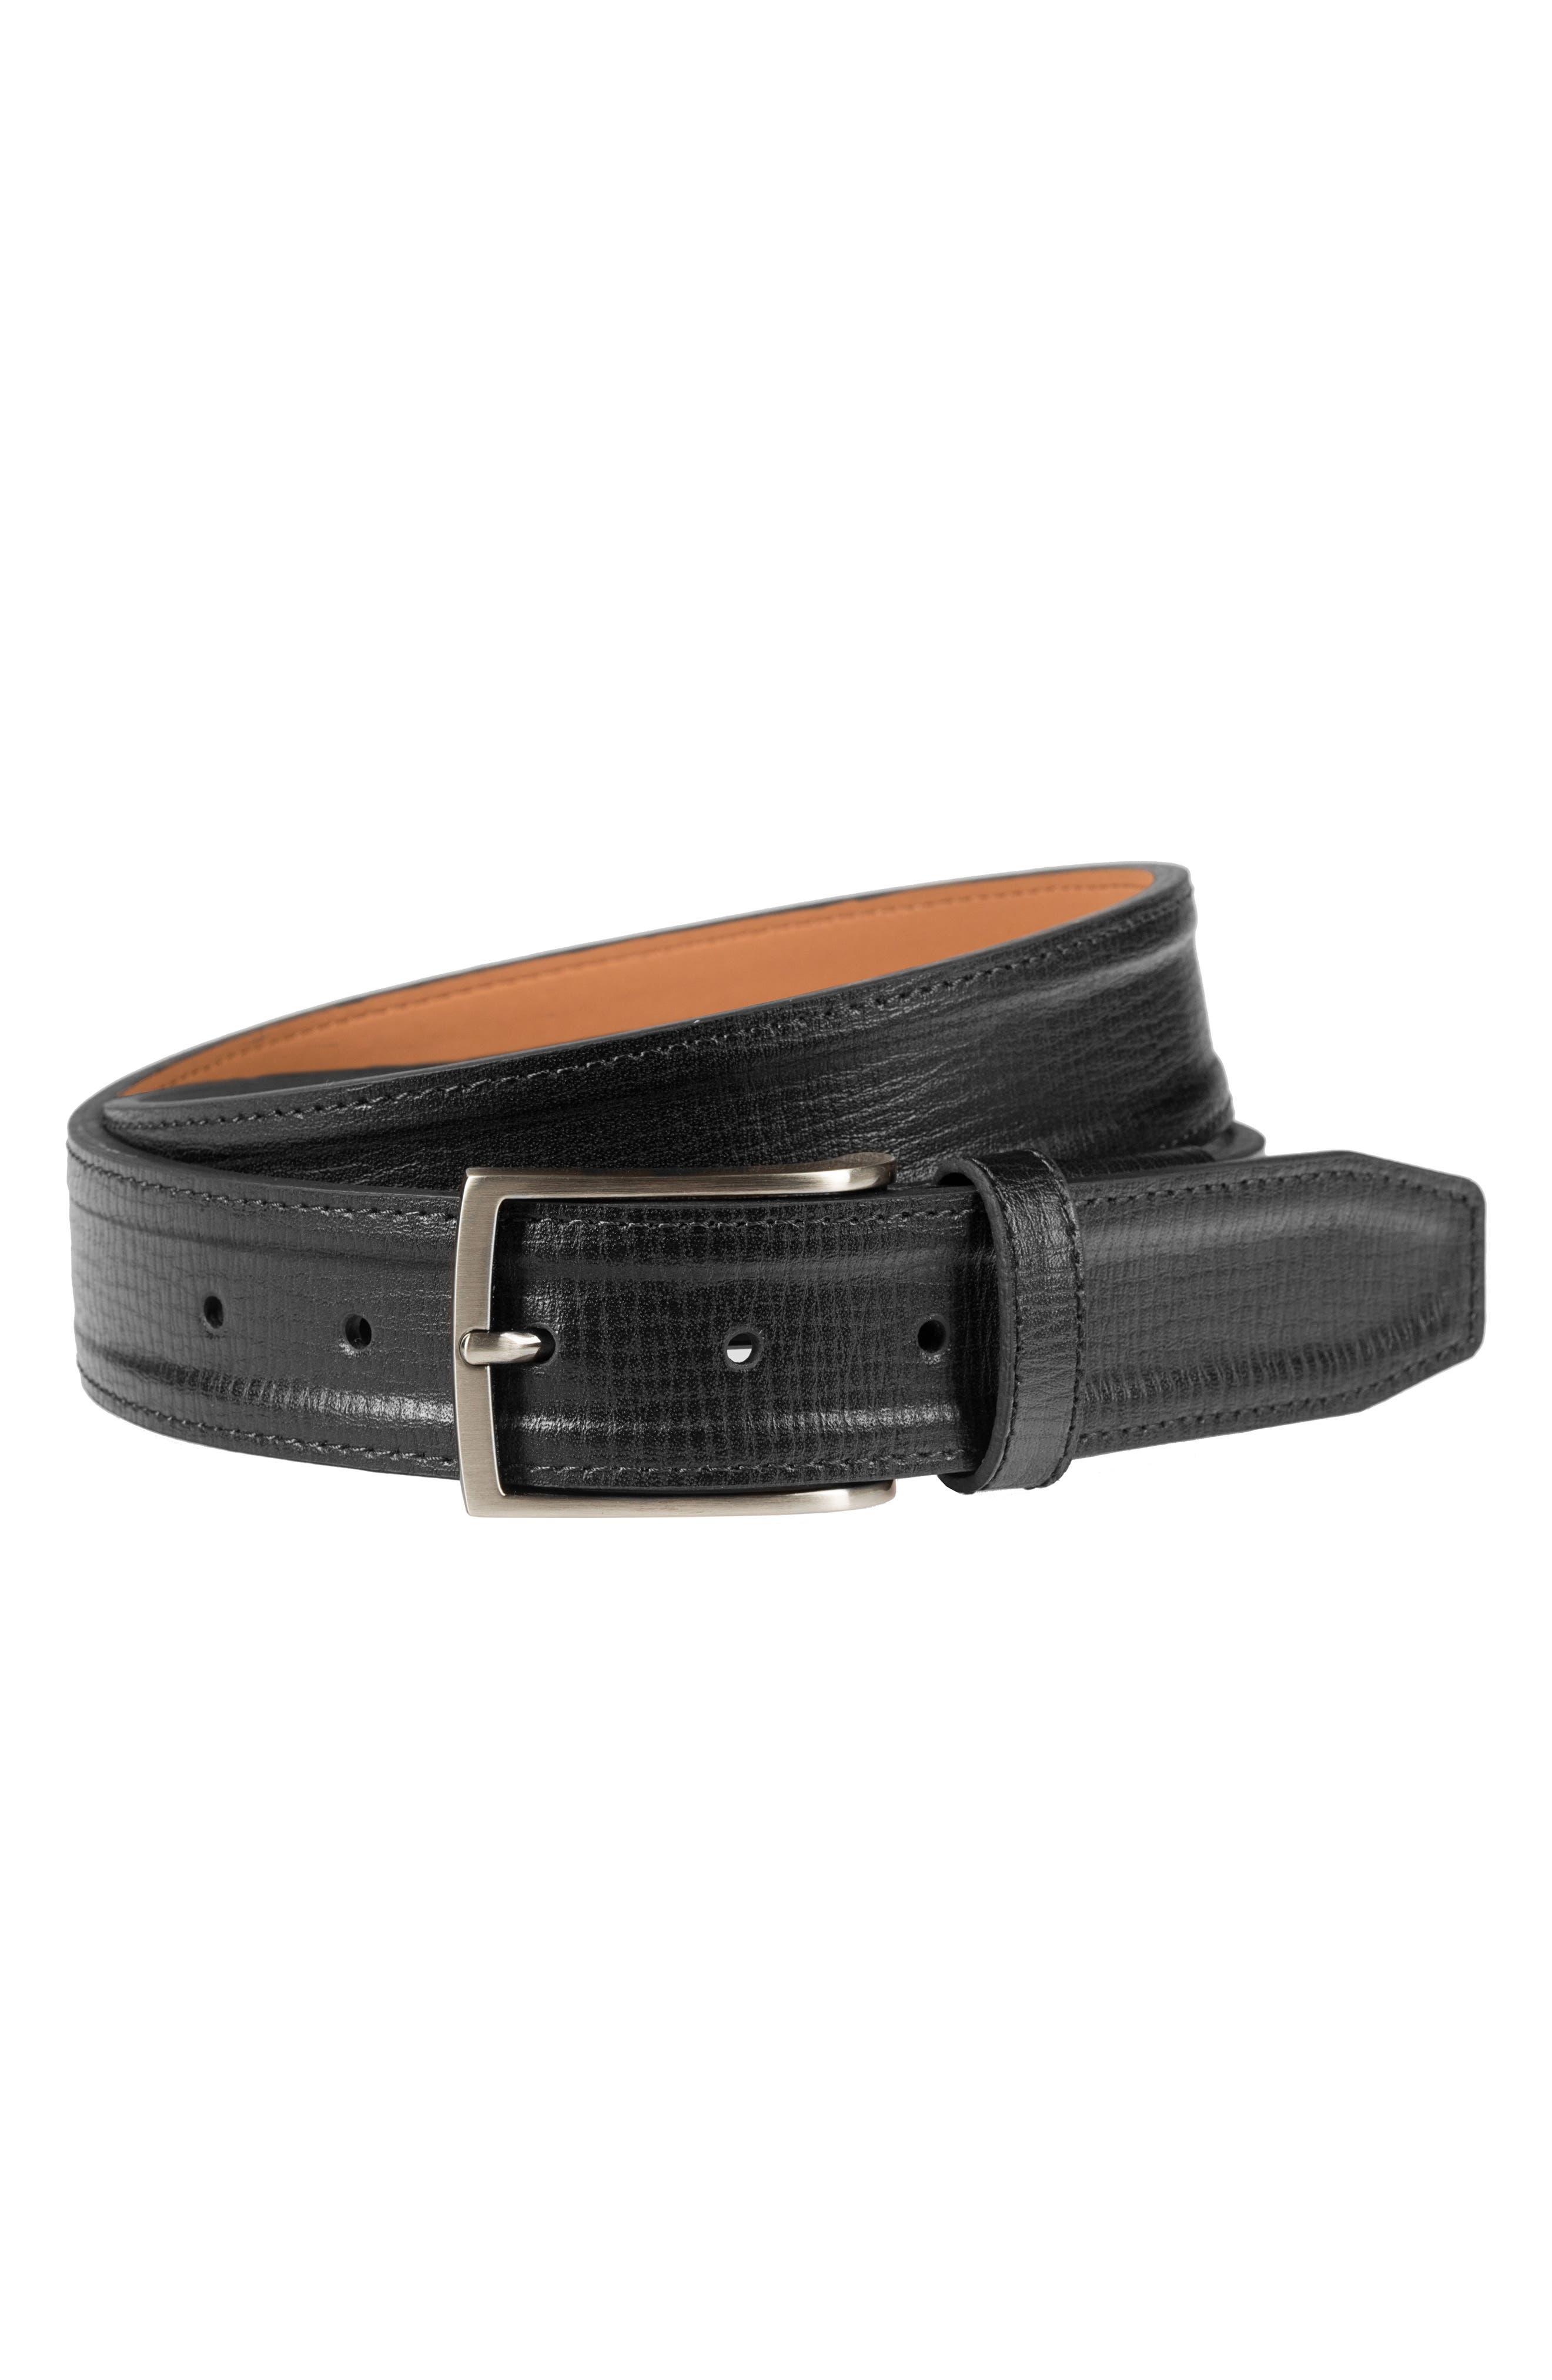 Alternate Image 1 Selected - Nike Trapunto G Flex Leather Belt